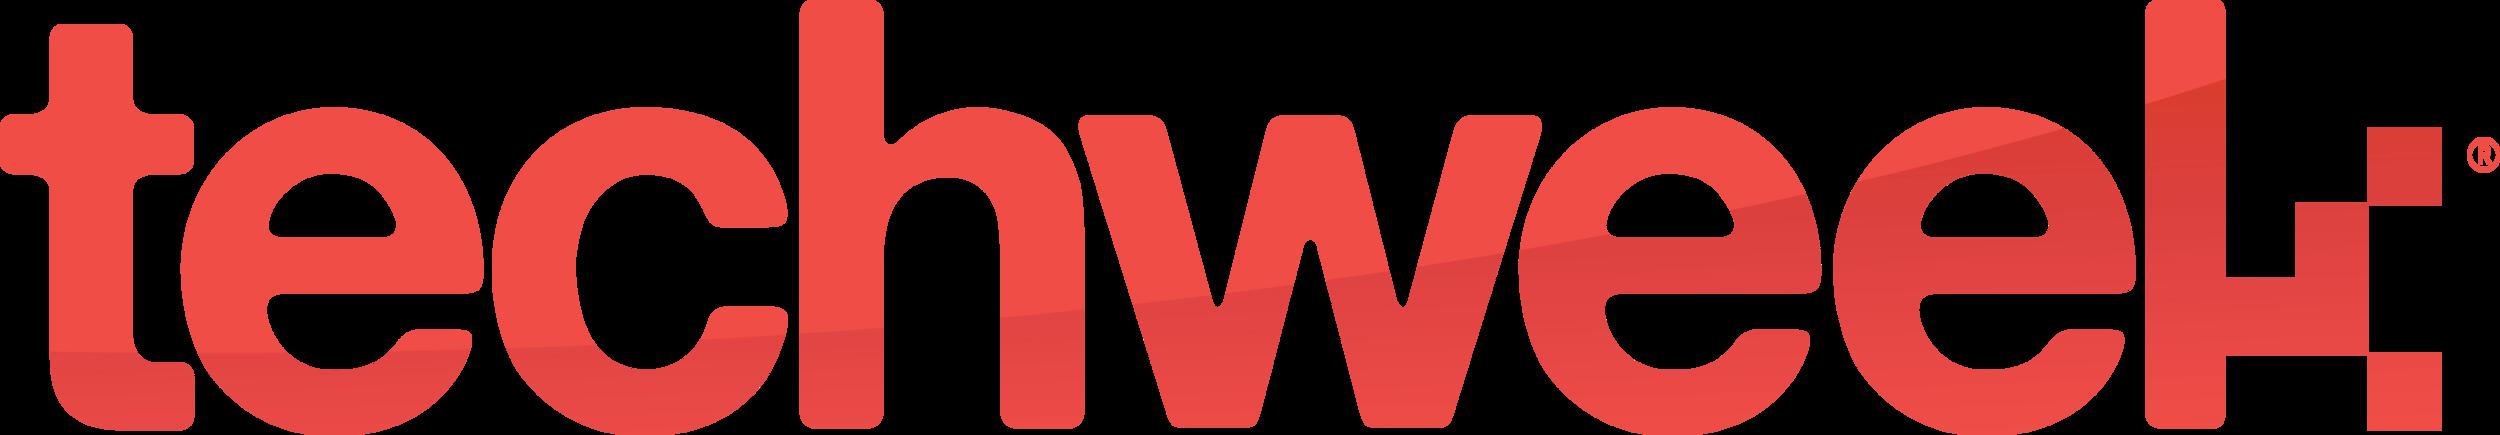 techweek_logo_red_24176.png